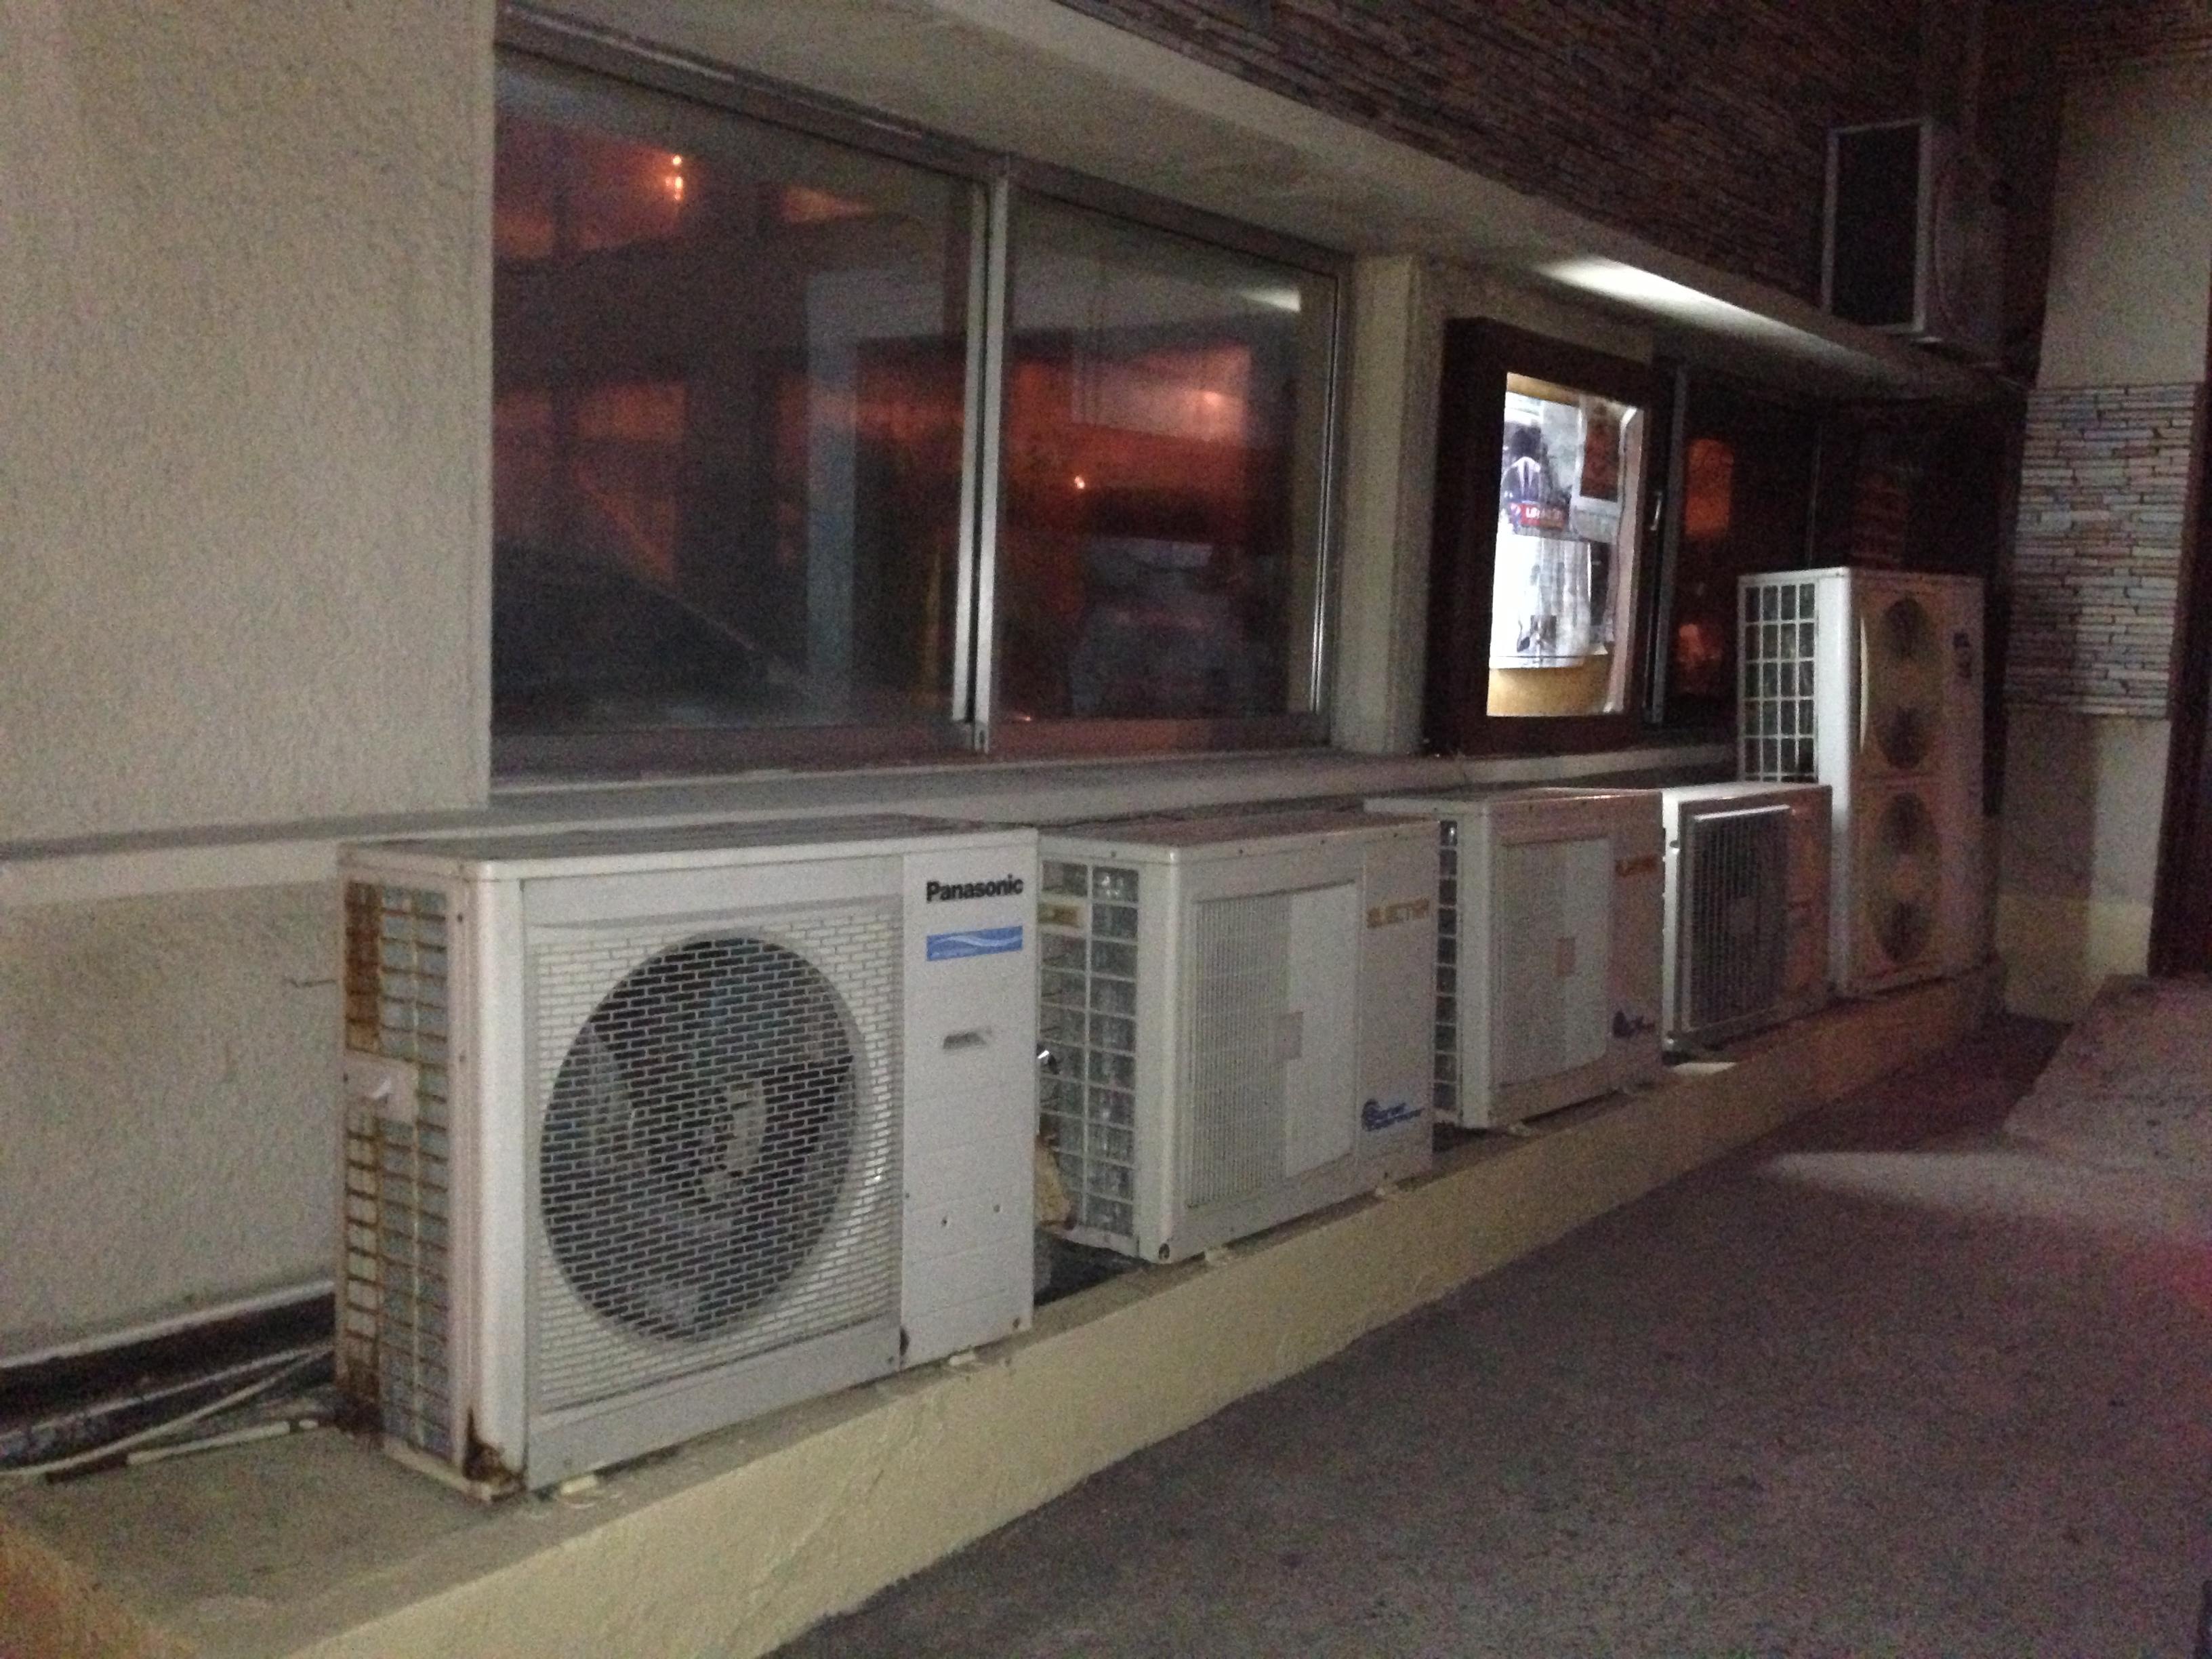 "<img src=http://""Lagos_Air_Cooling_System.jpg""?w=233&h=175 alt=""Lagos Air Cooling System"">"